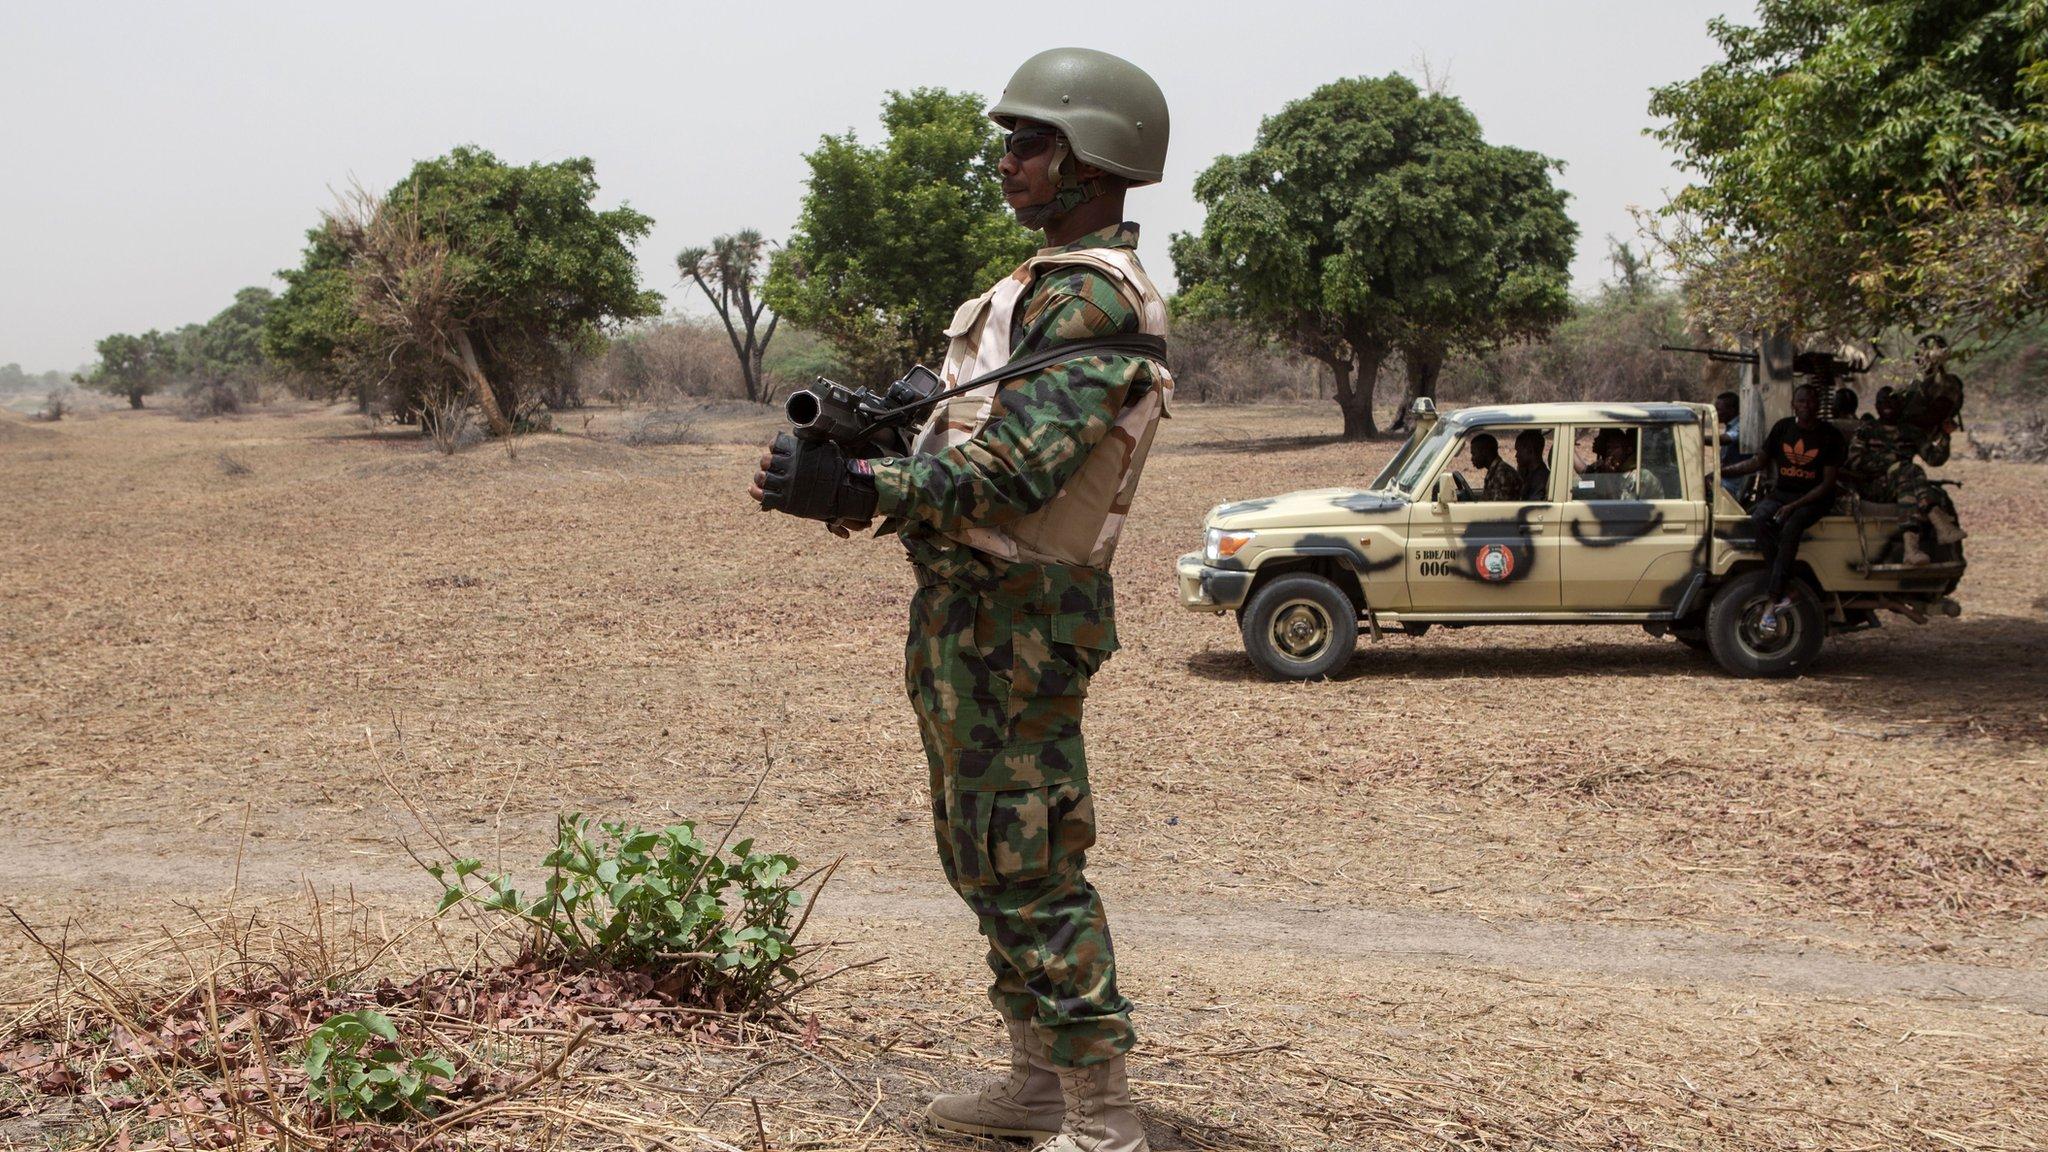 Zamfara: Are banditry killings in Nigeria getting worse?